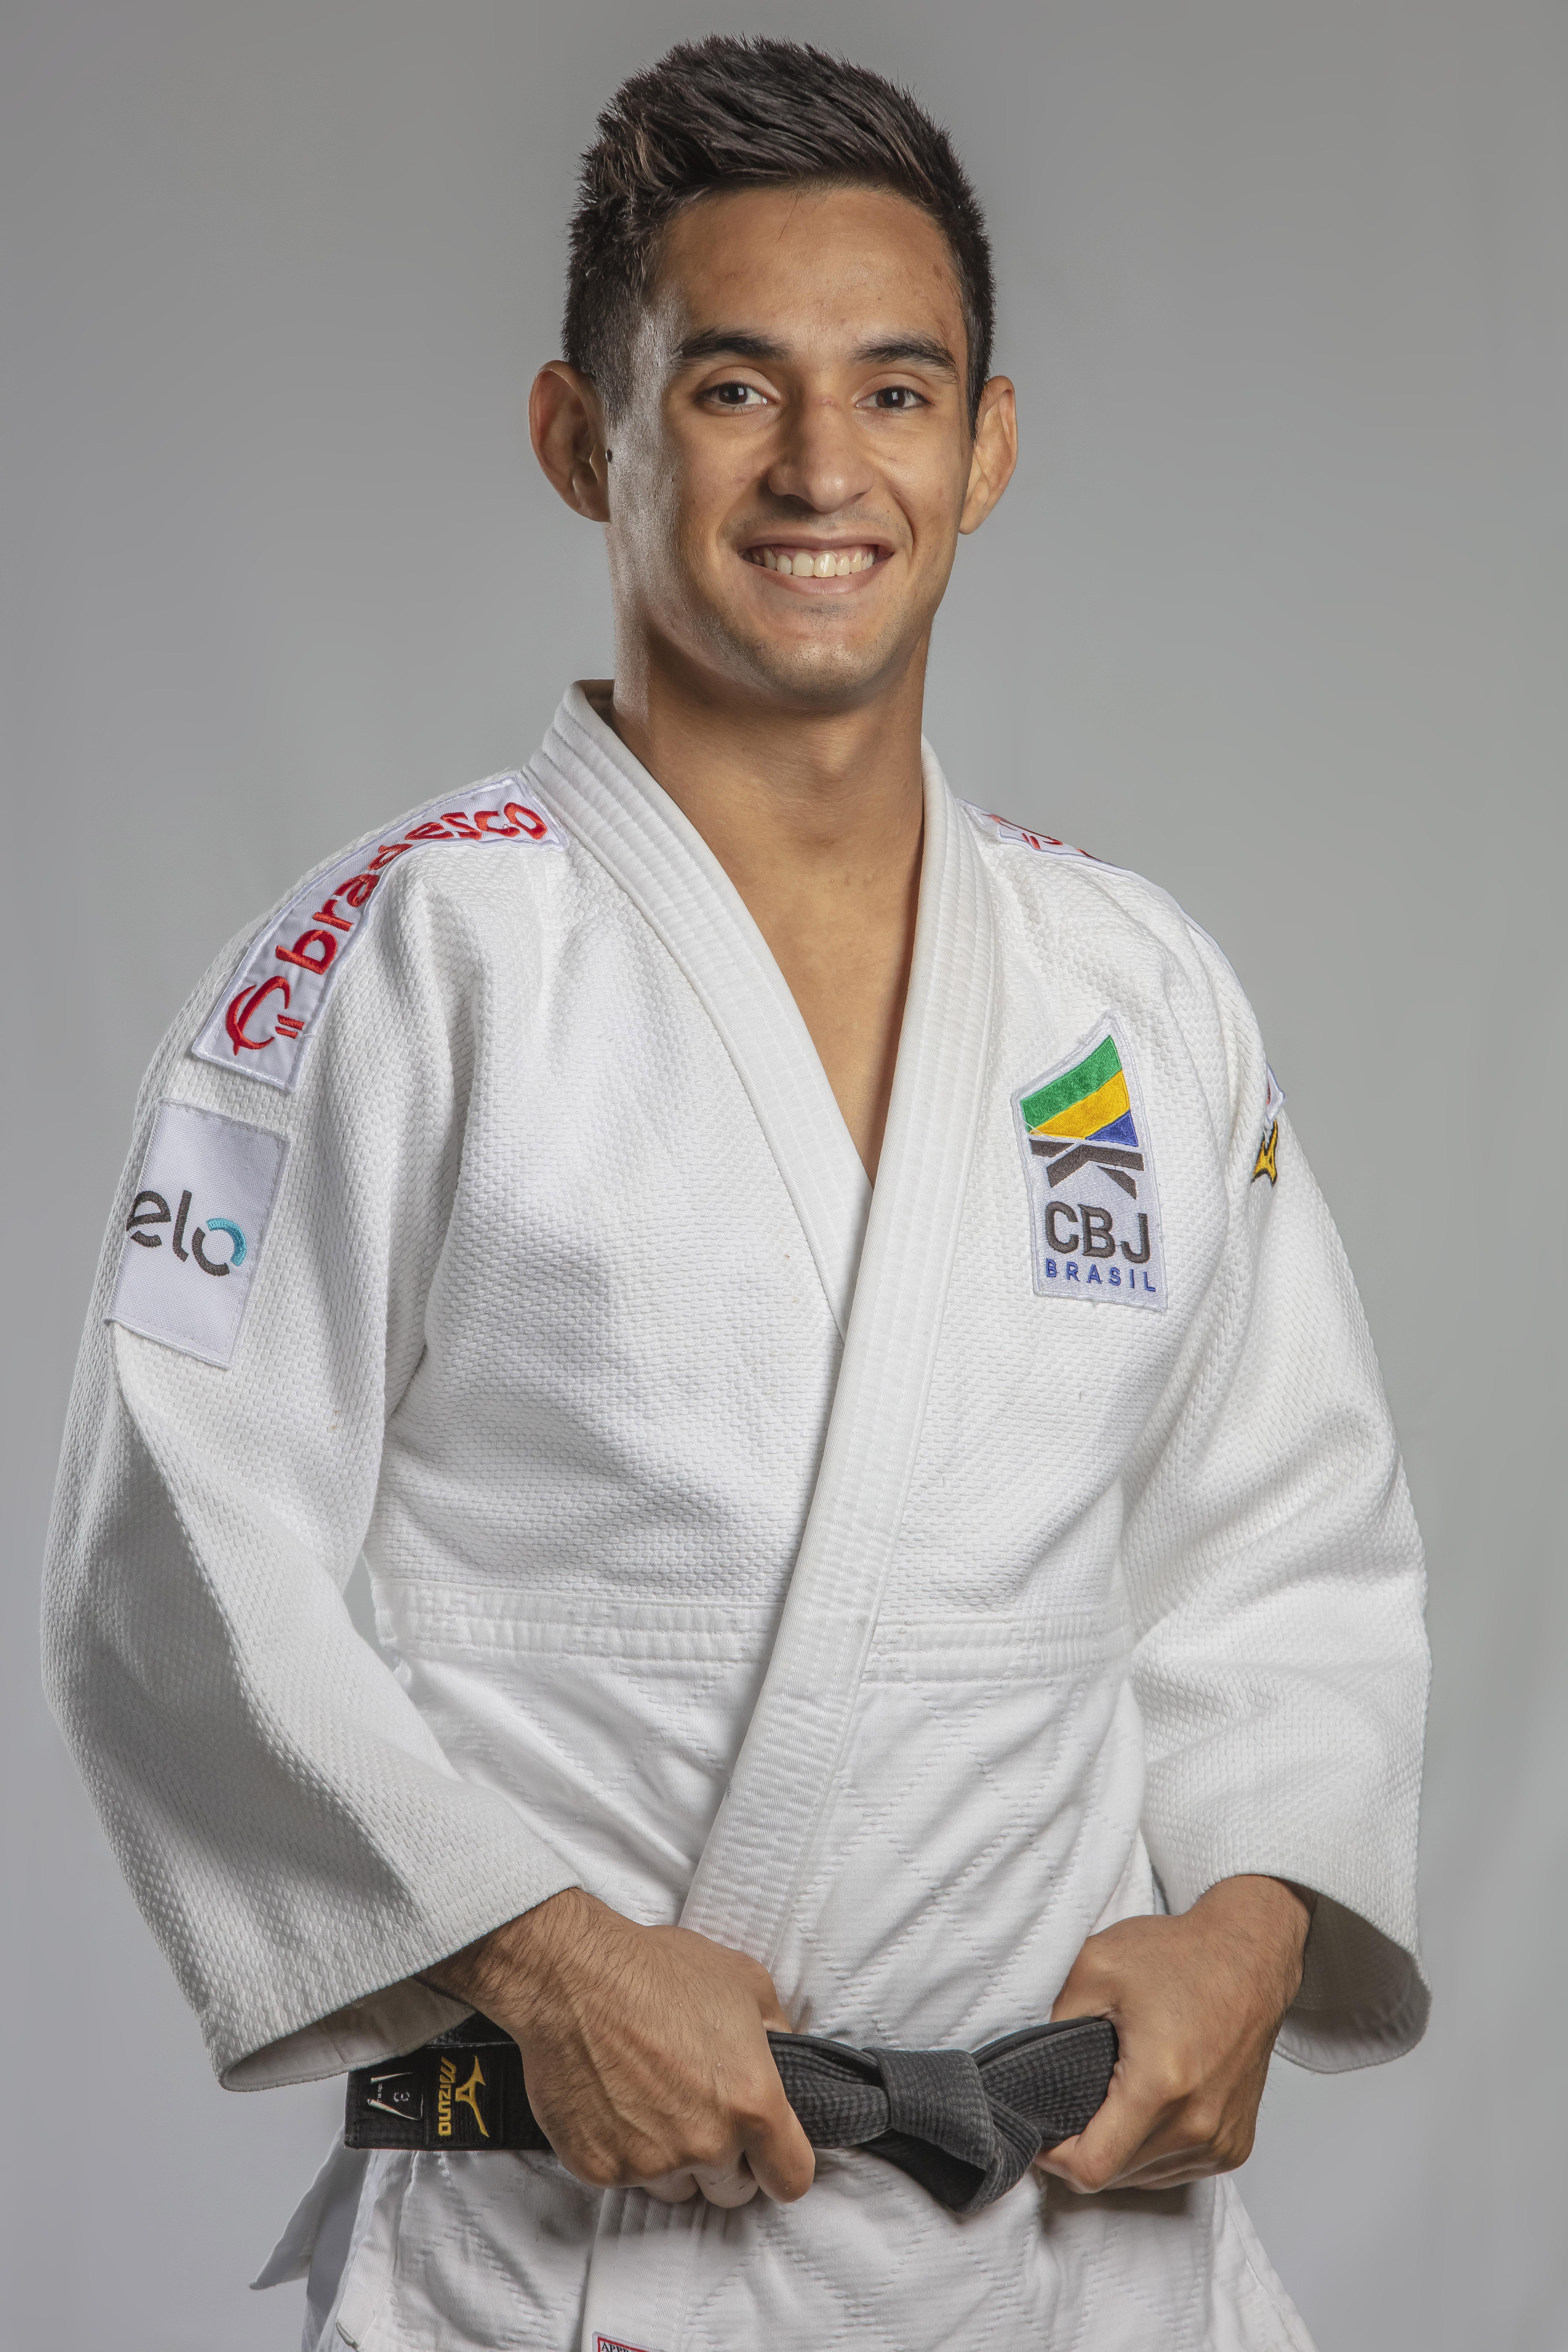 Eric Gomes Takabatake